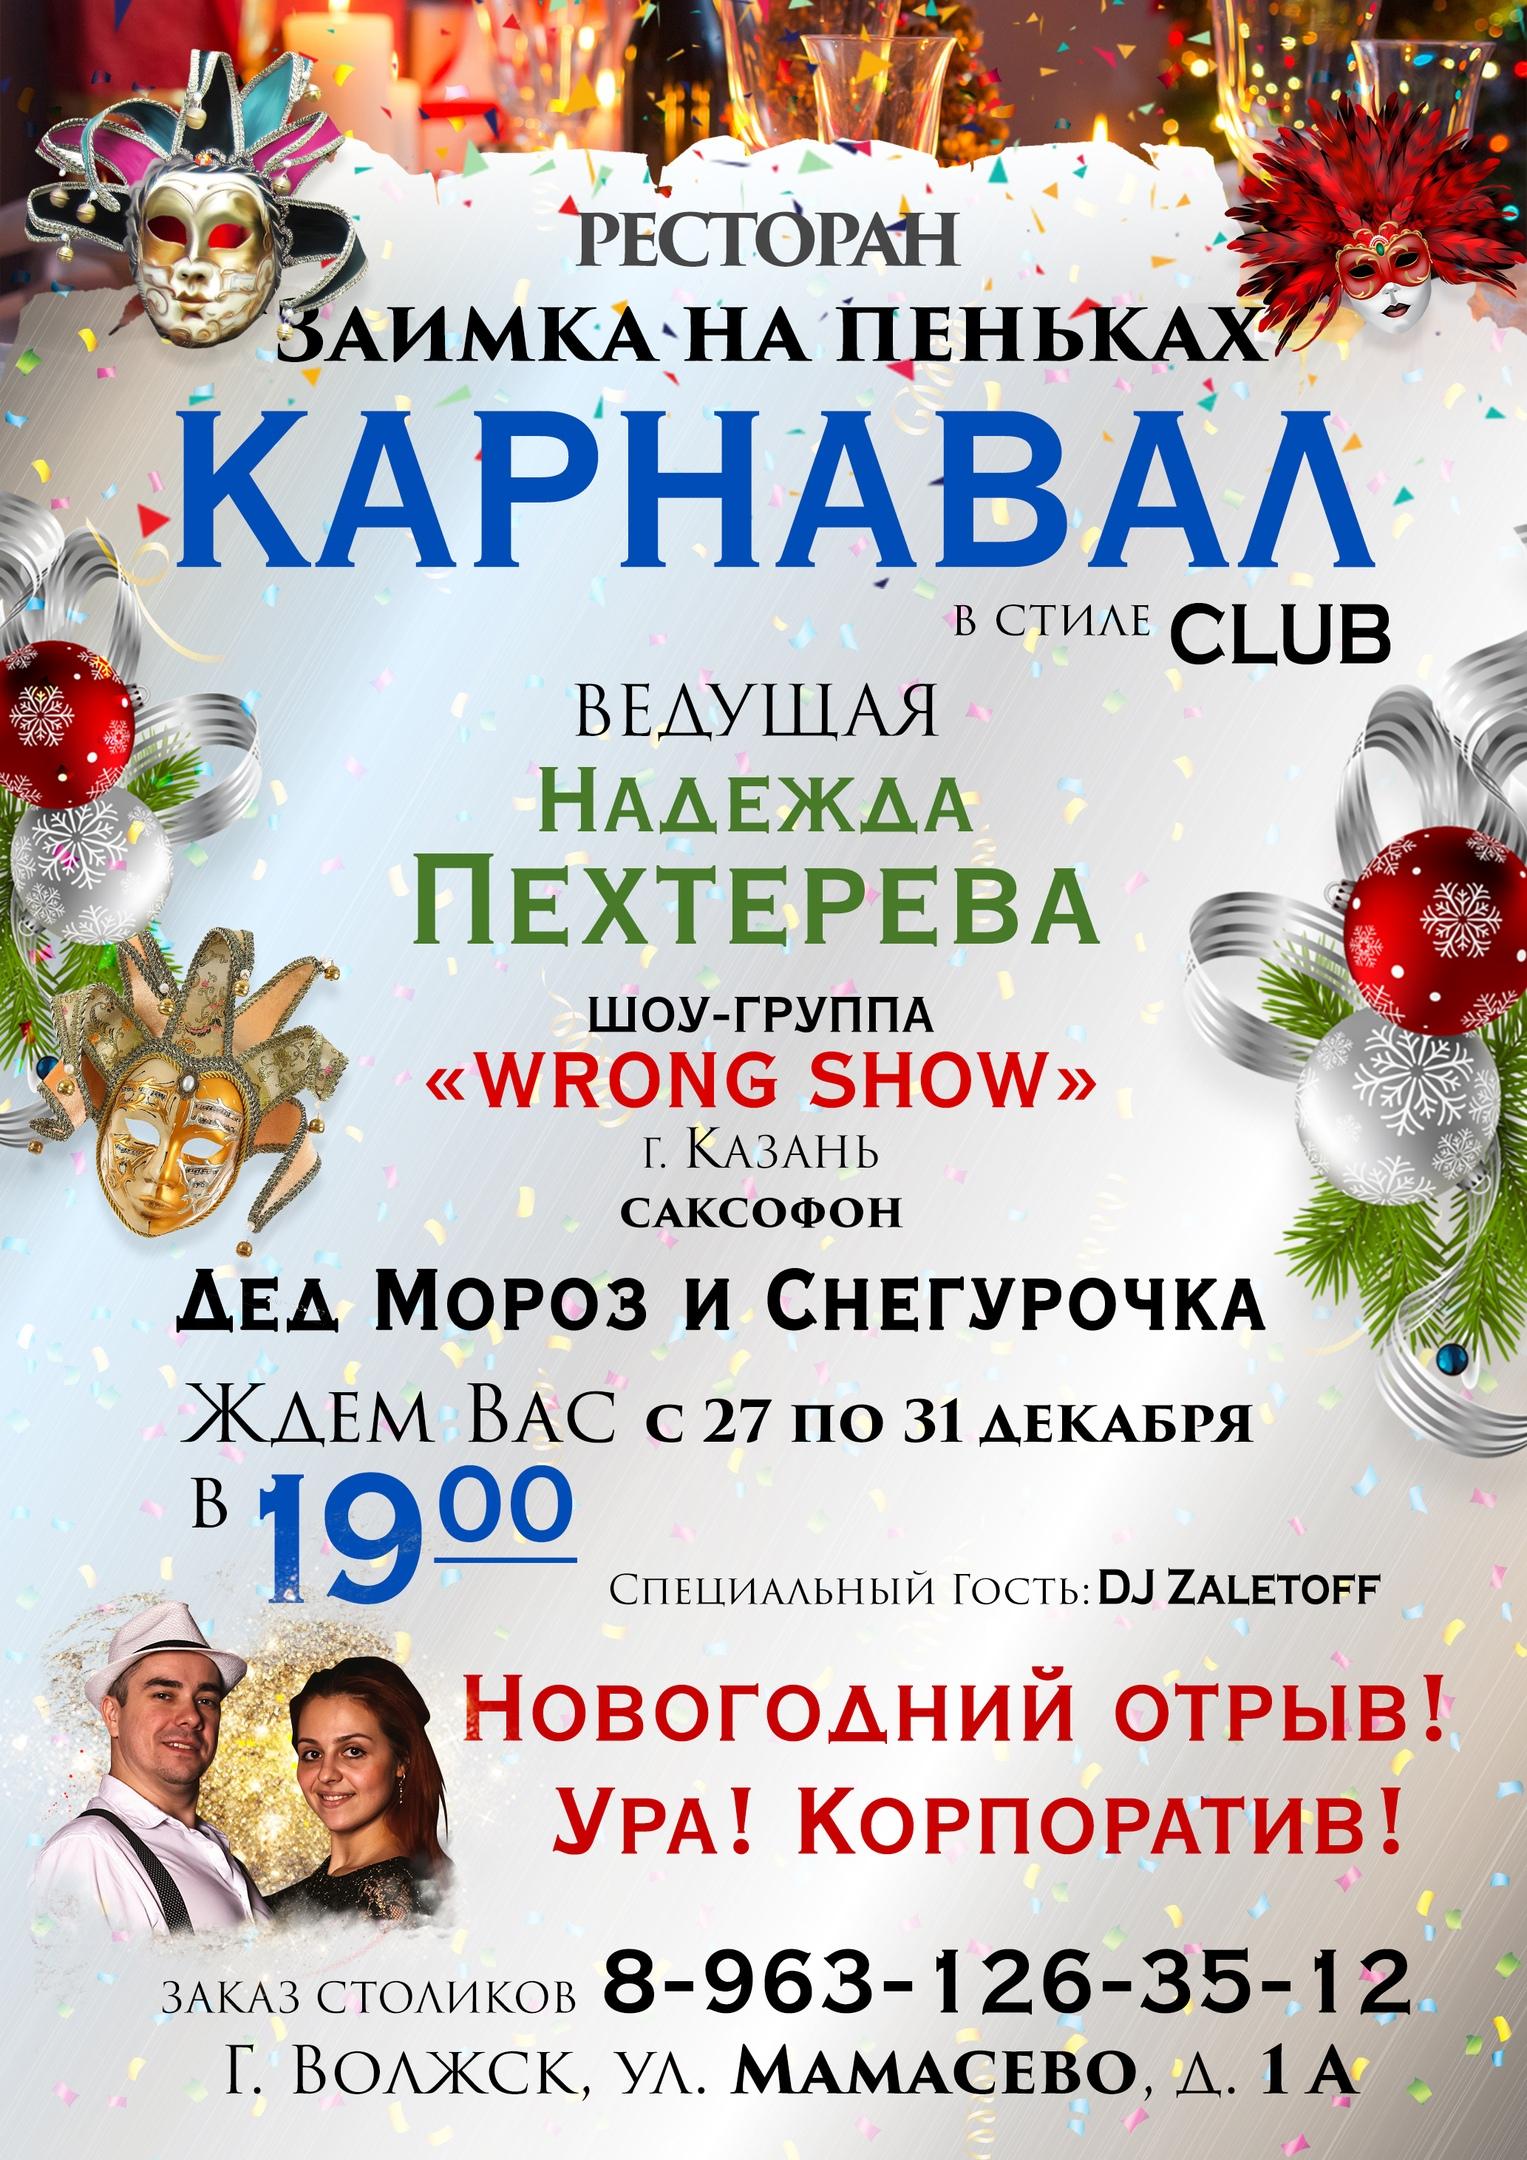 Кафе «На пеньках» - Вконтакте